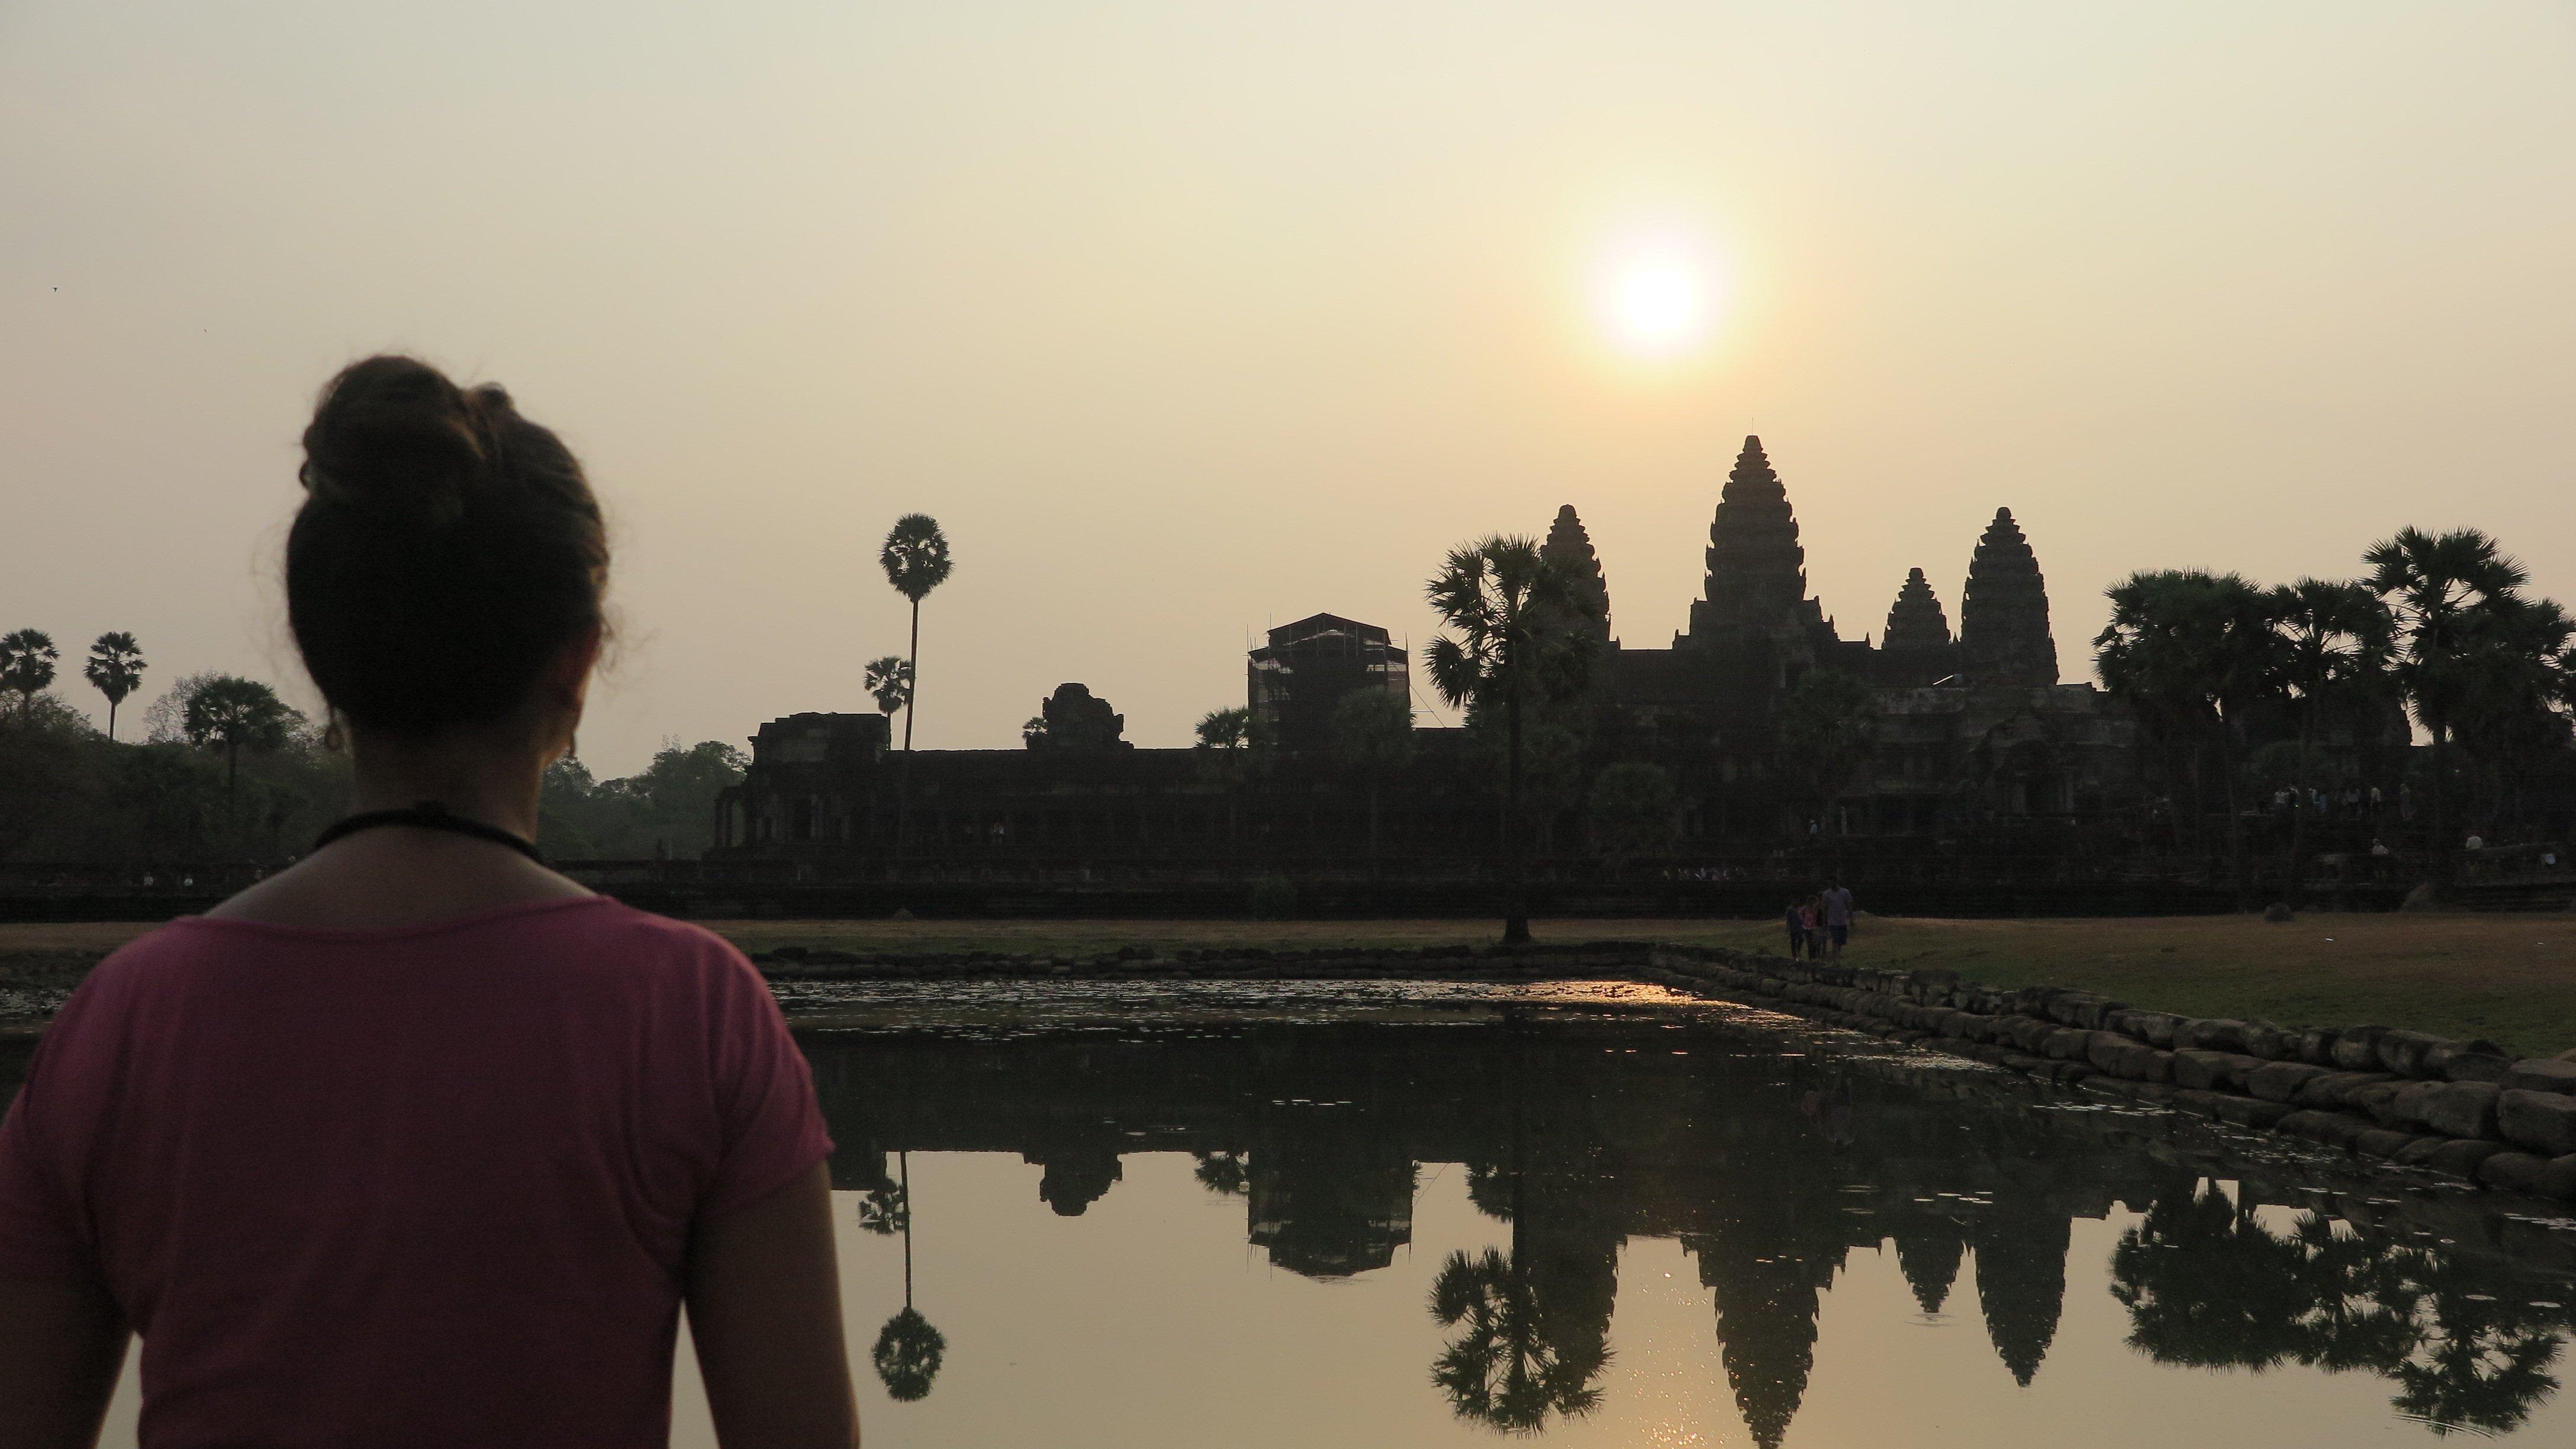 Themy em AngkorWat, no Camboja